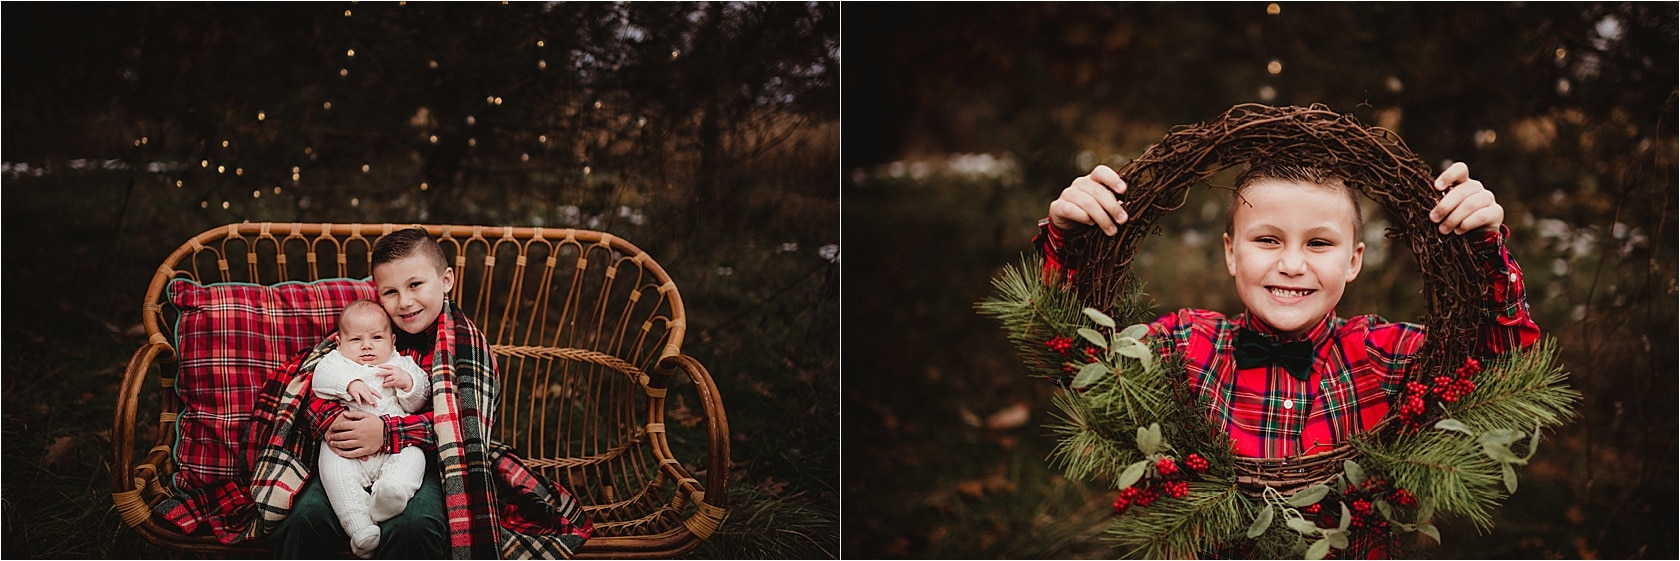 Little Boy with Wreath